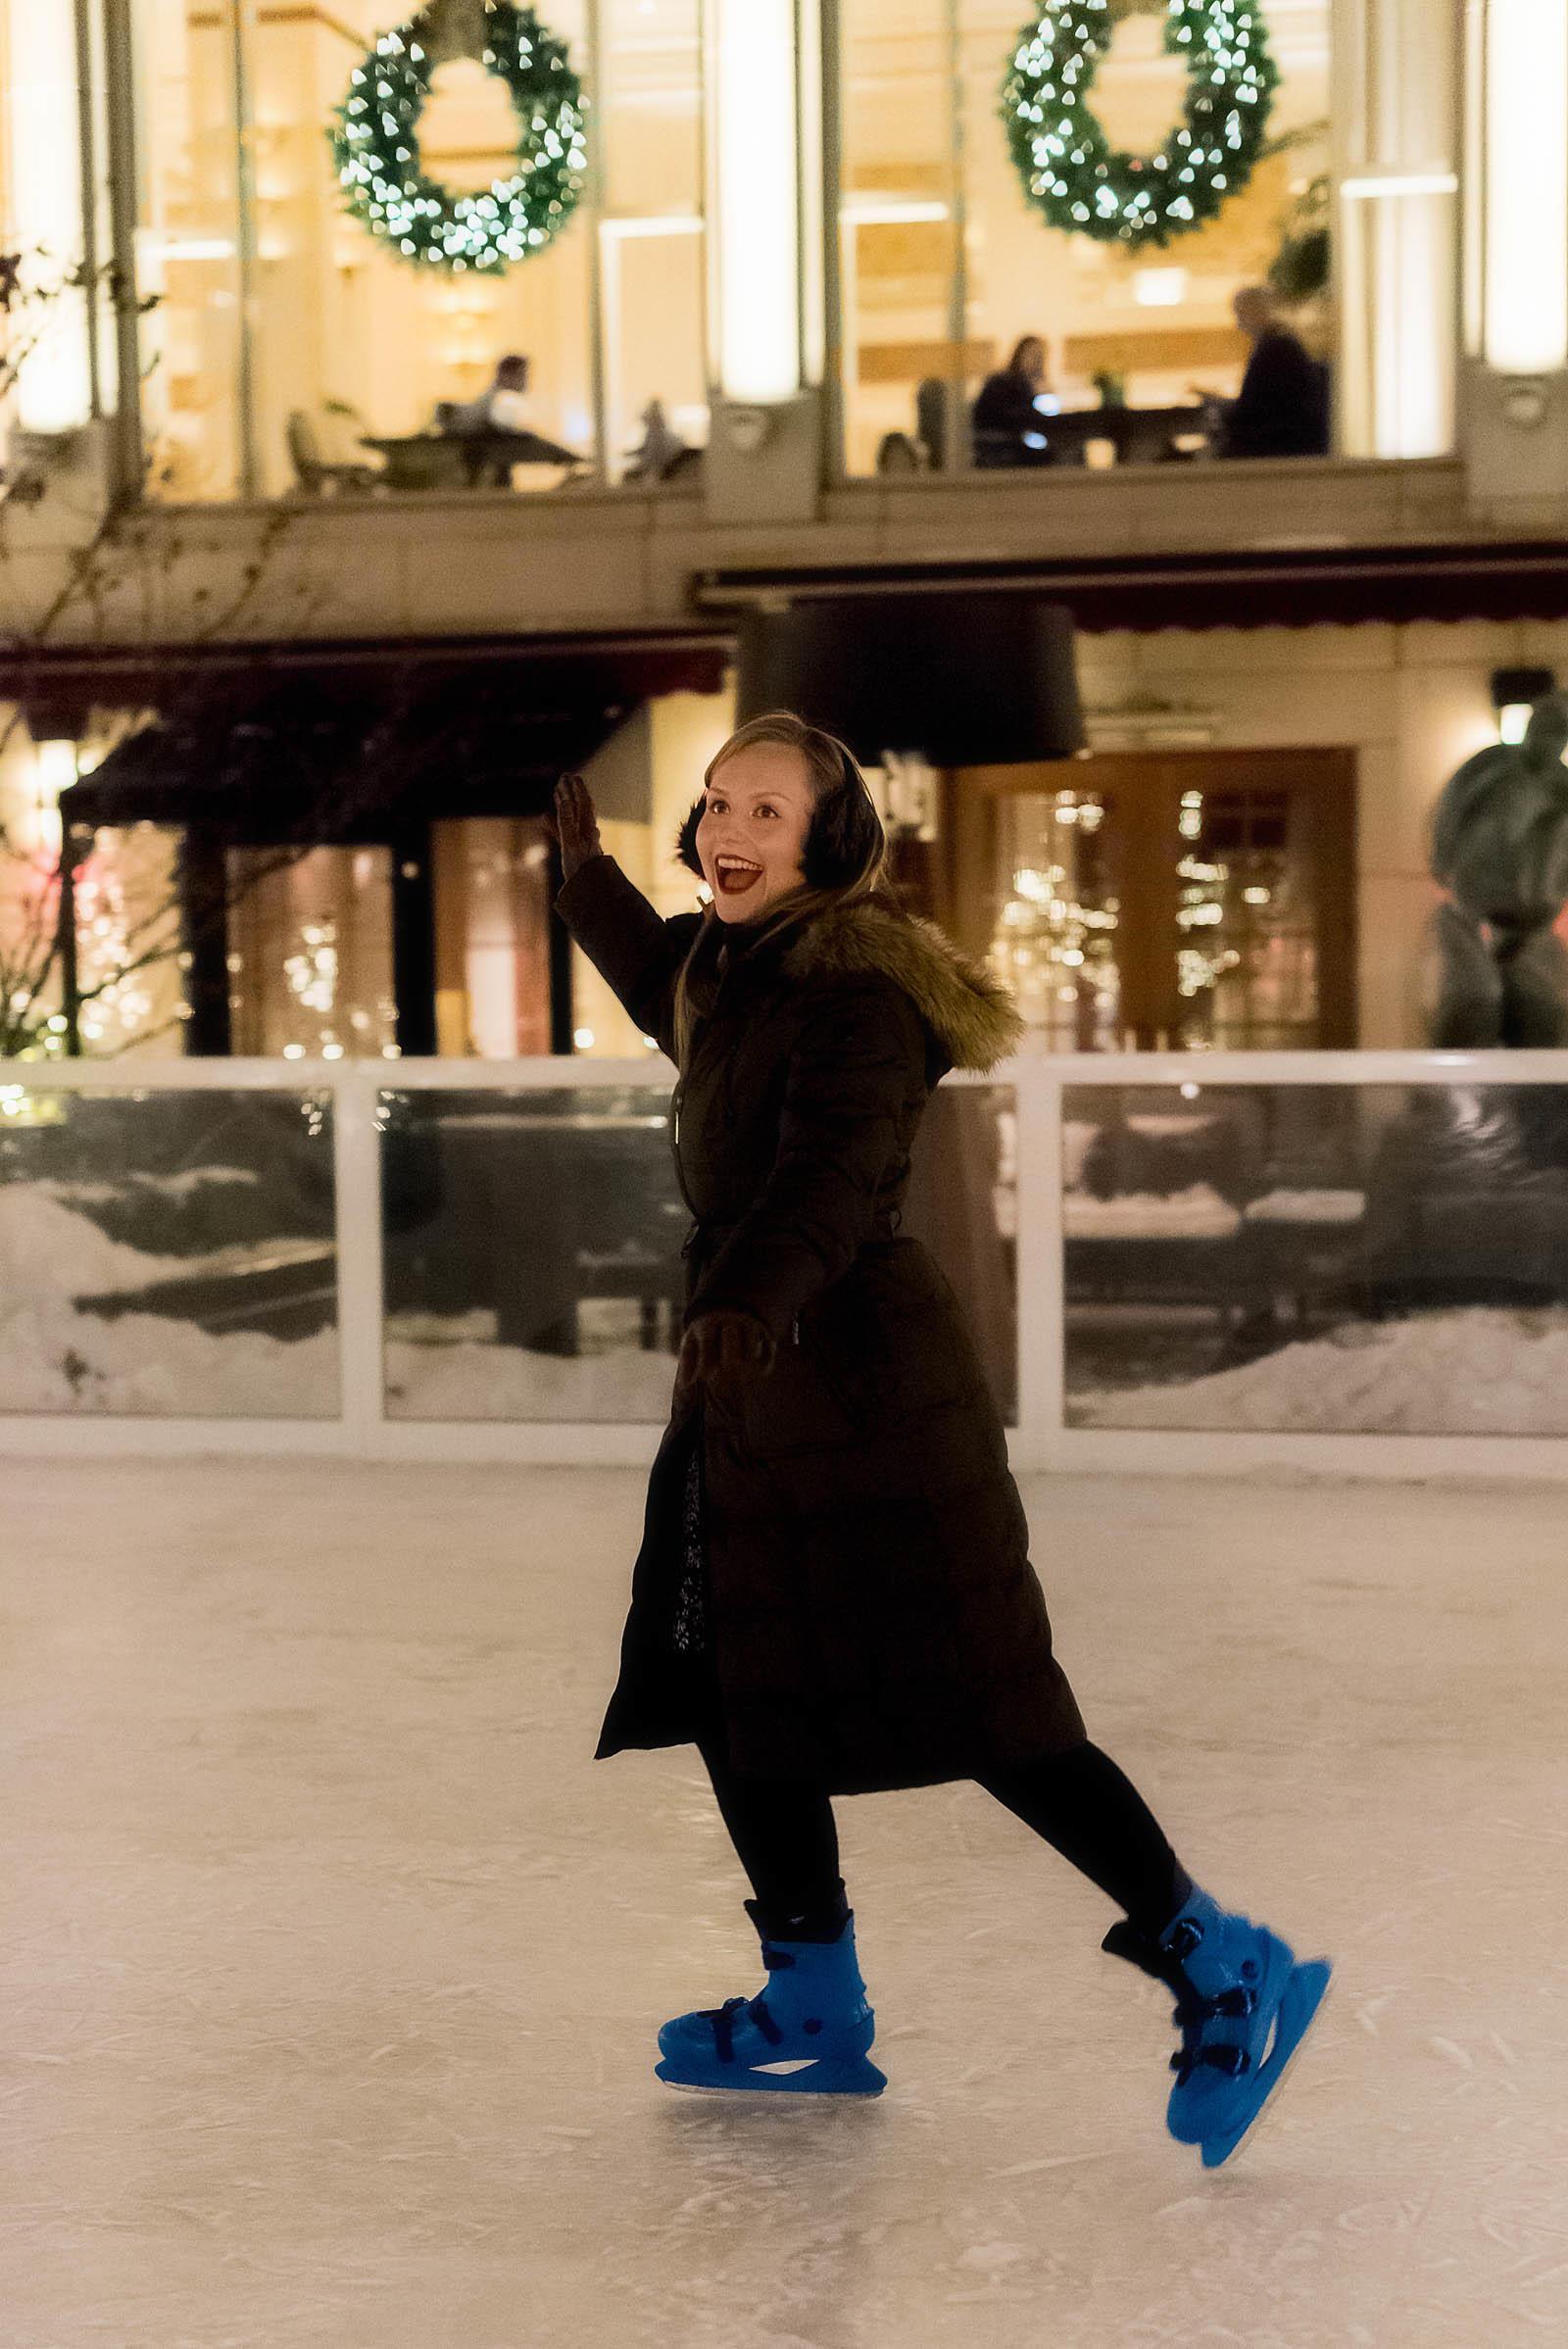 Peninsula Hotel Chicago Holiday SkyRink Ice Rink